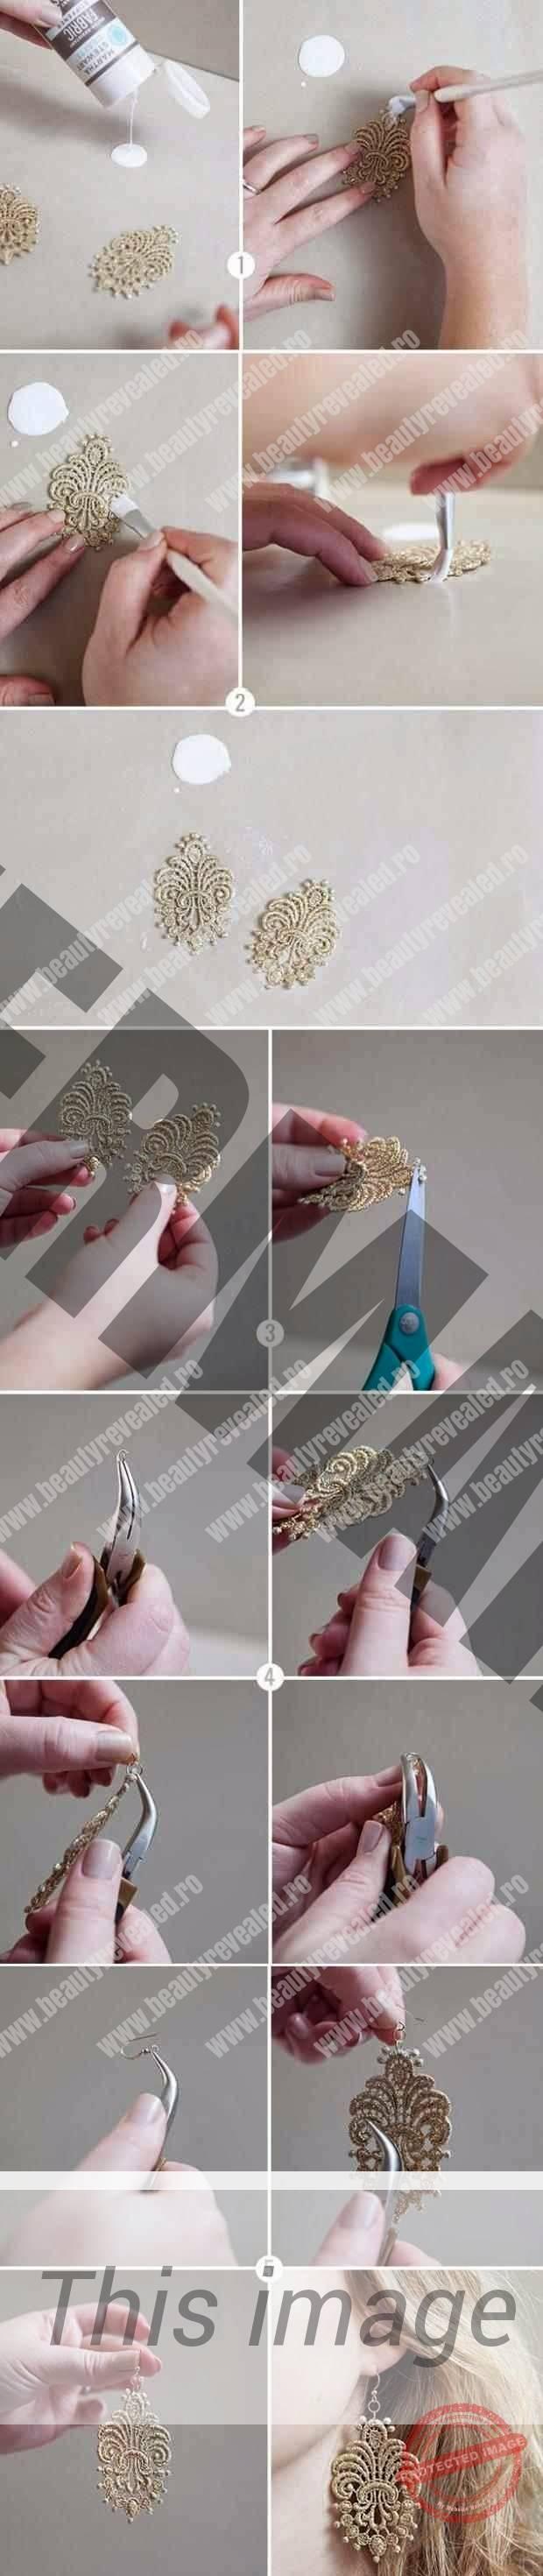 tutoriale_fashion_12